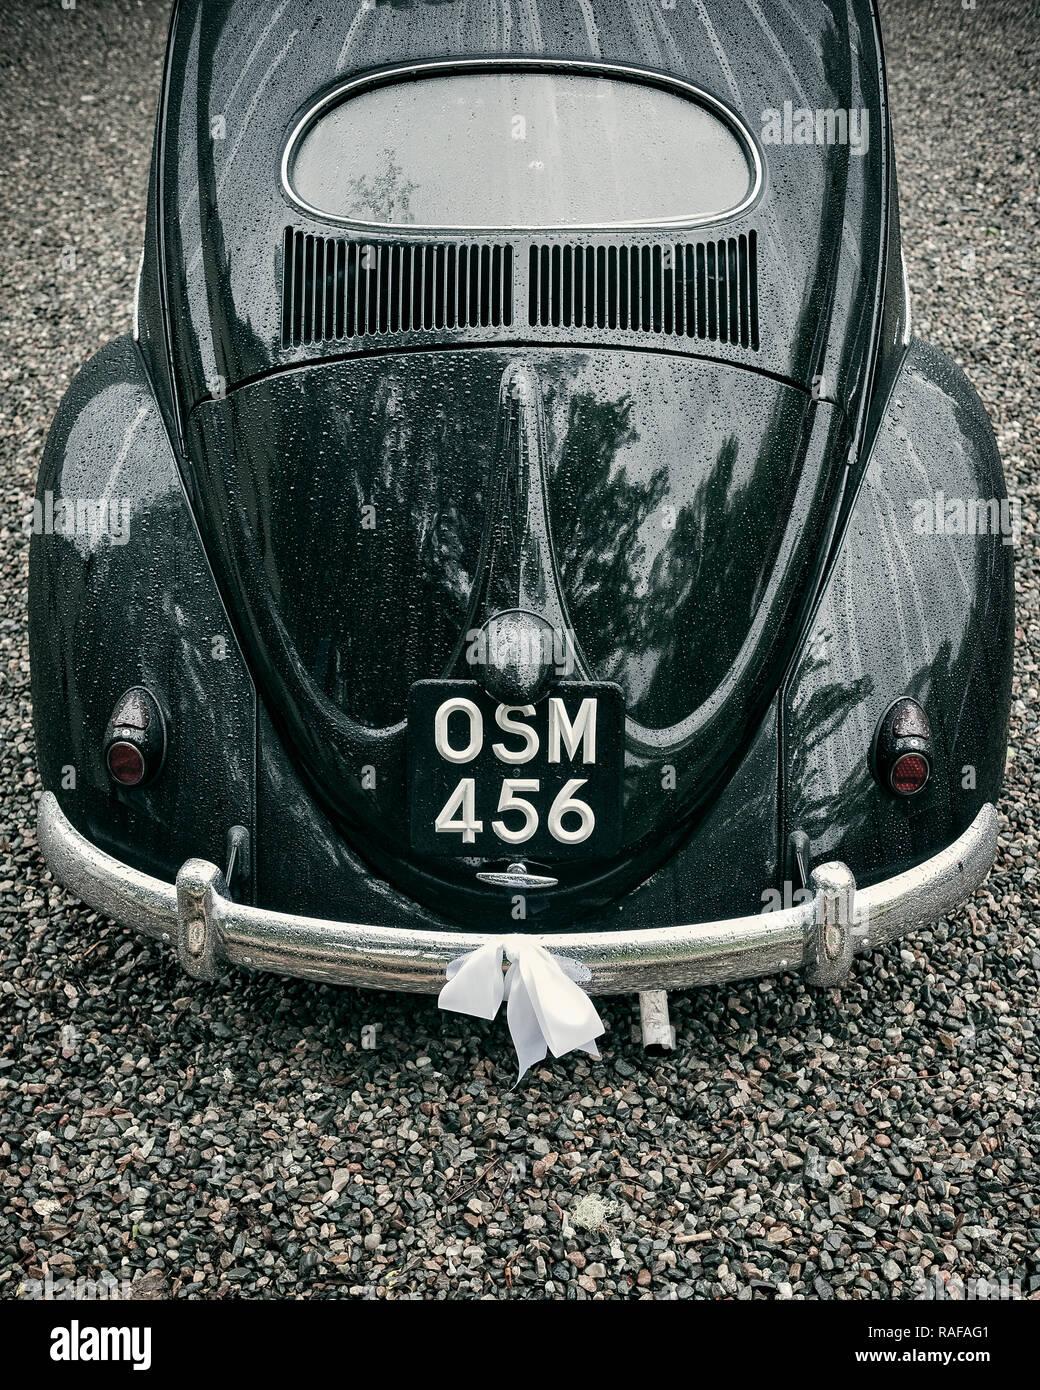 Classic vw beetle wedding car - Stock Image